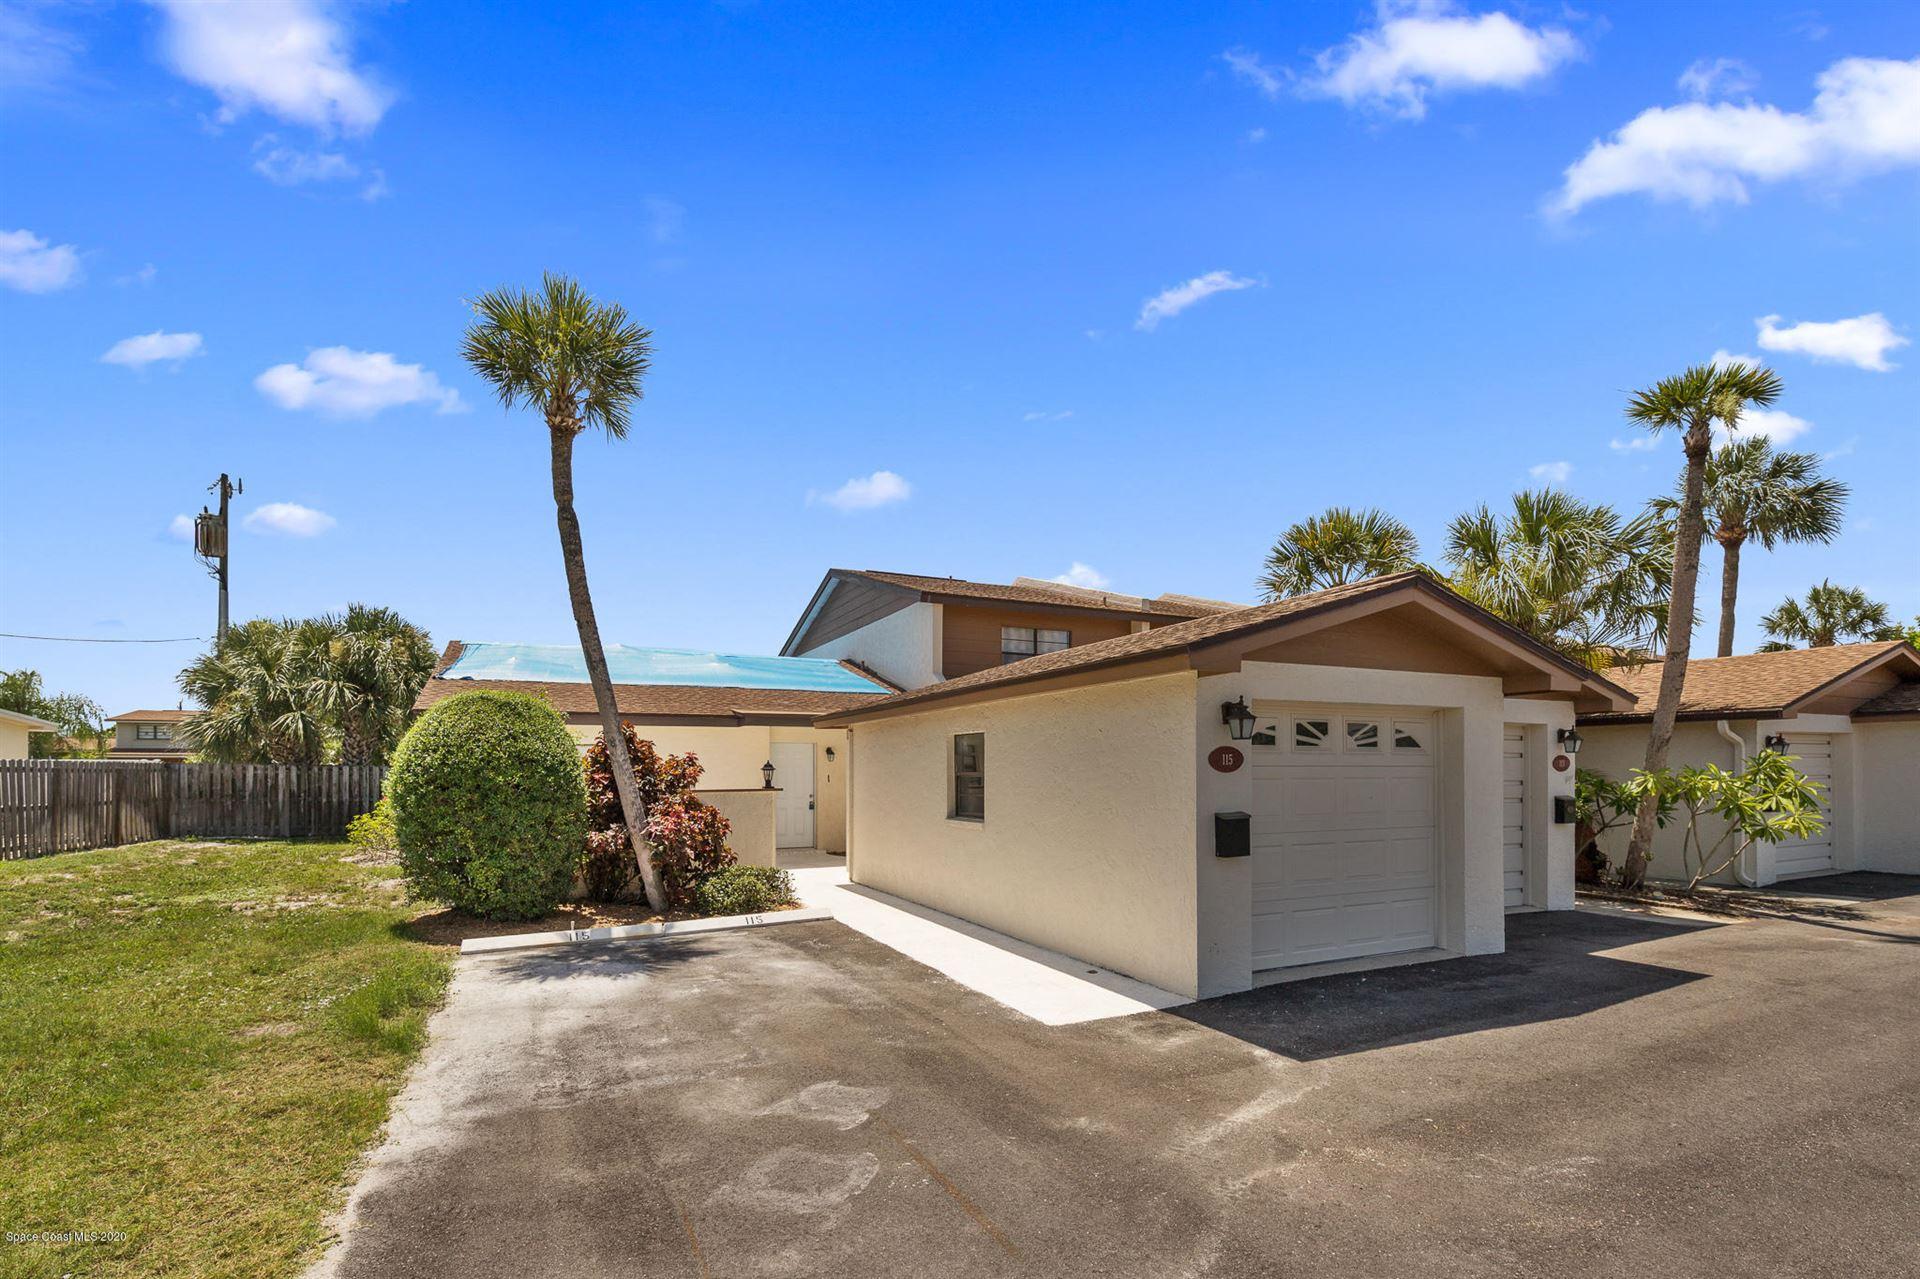 115 Kristi Drive #115, Indian Harbour Beach, FL 32937 - #: 881303